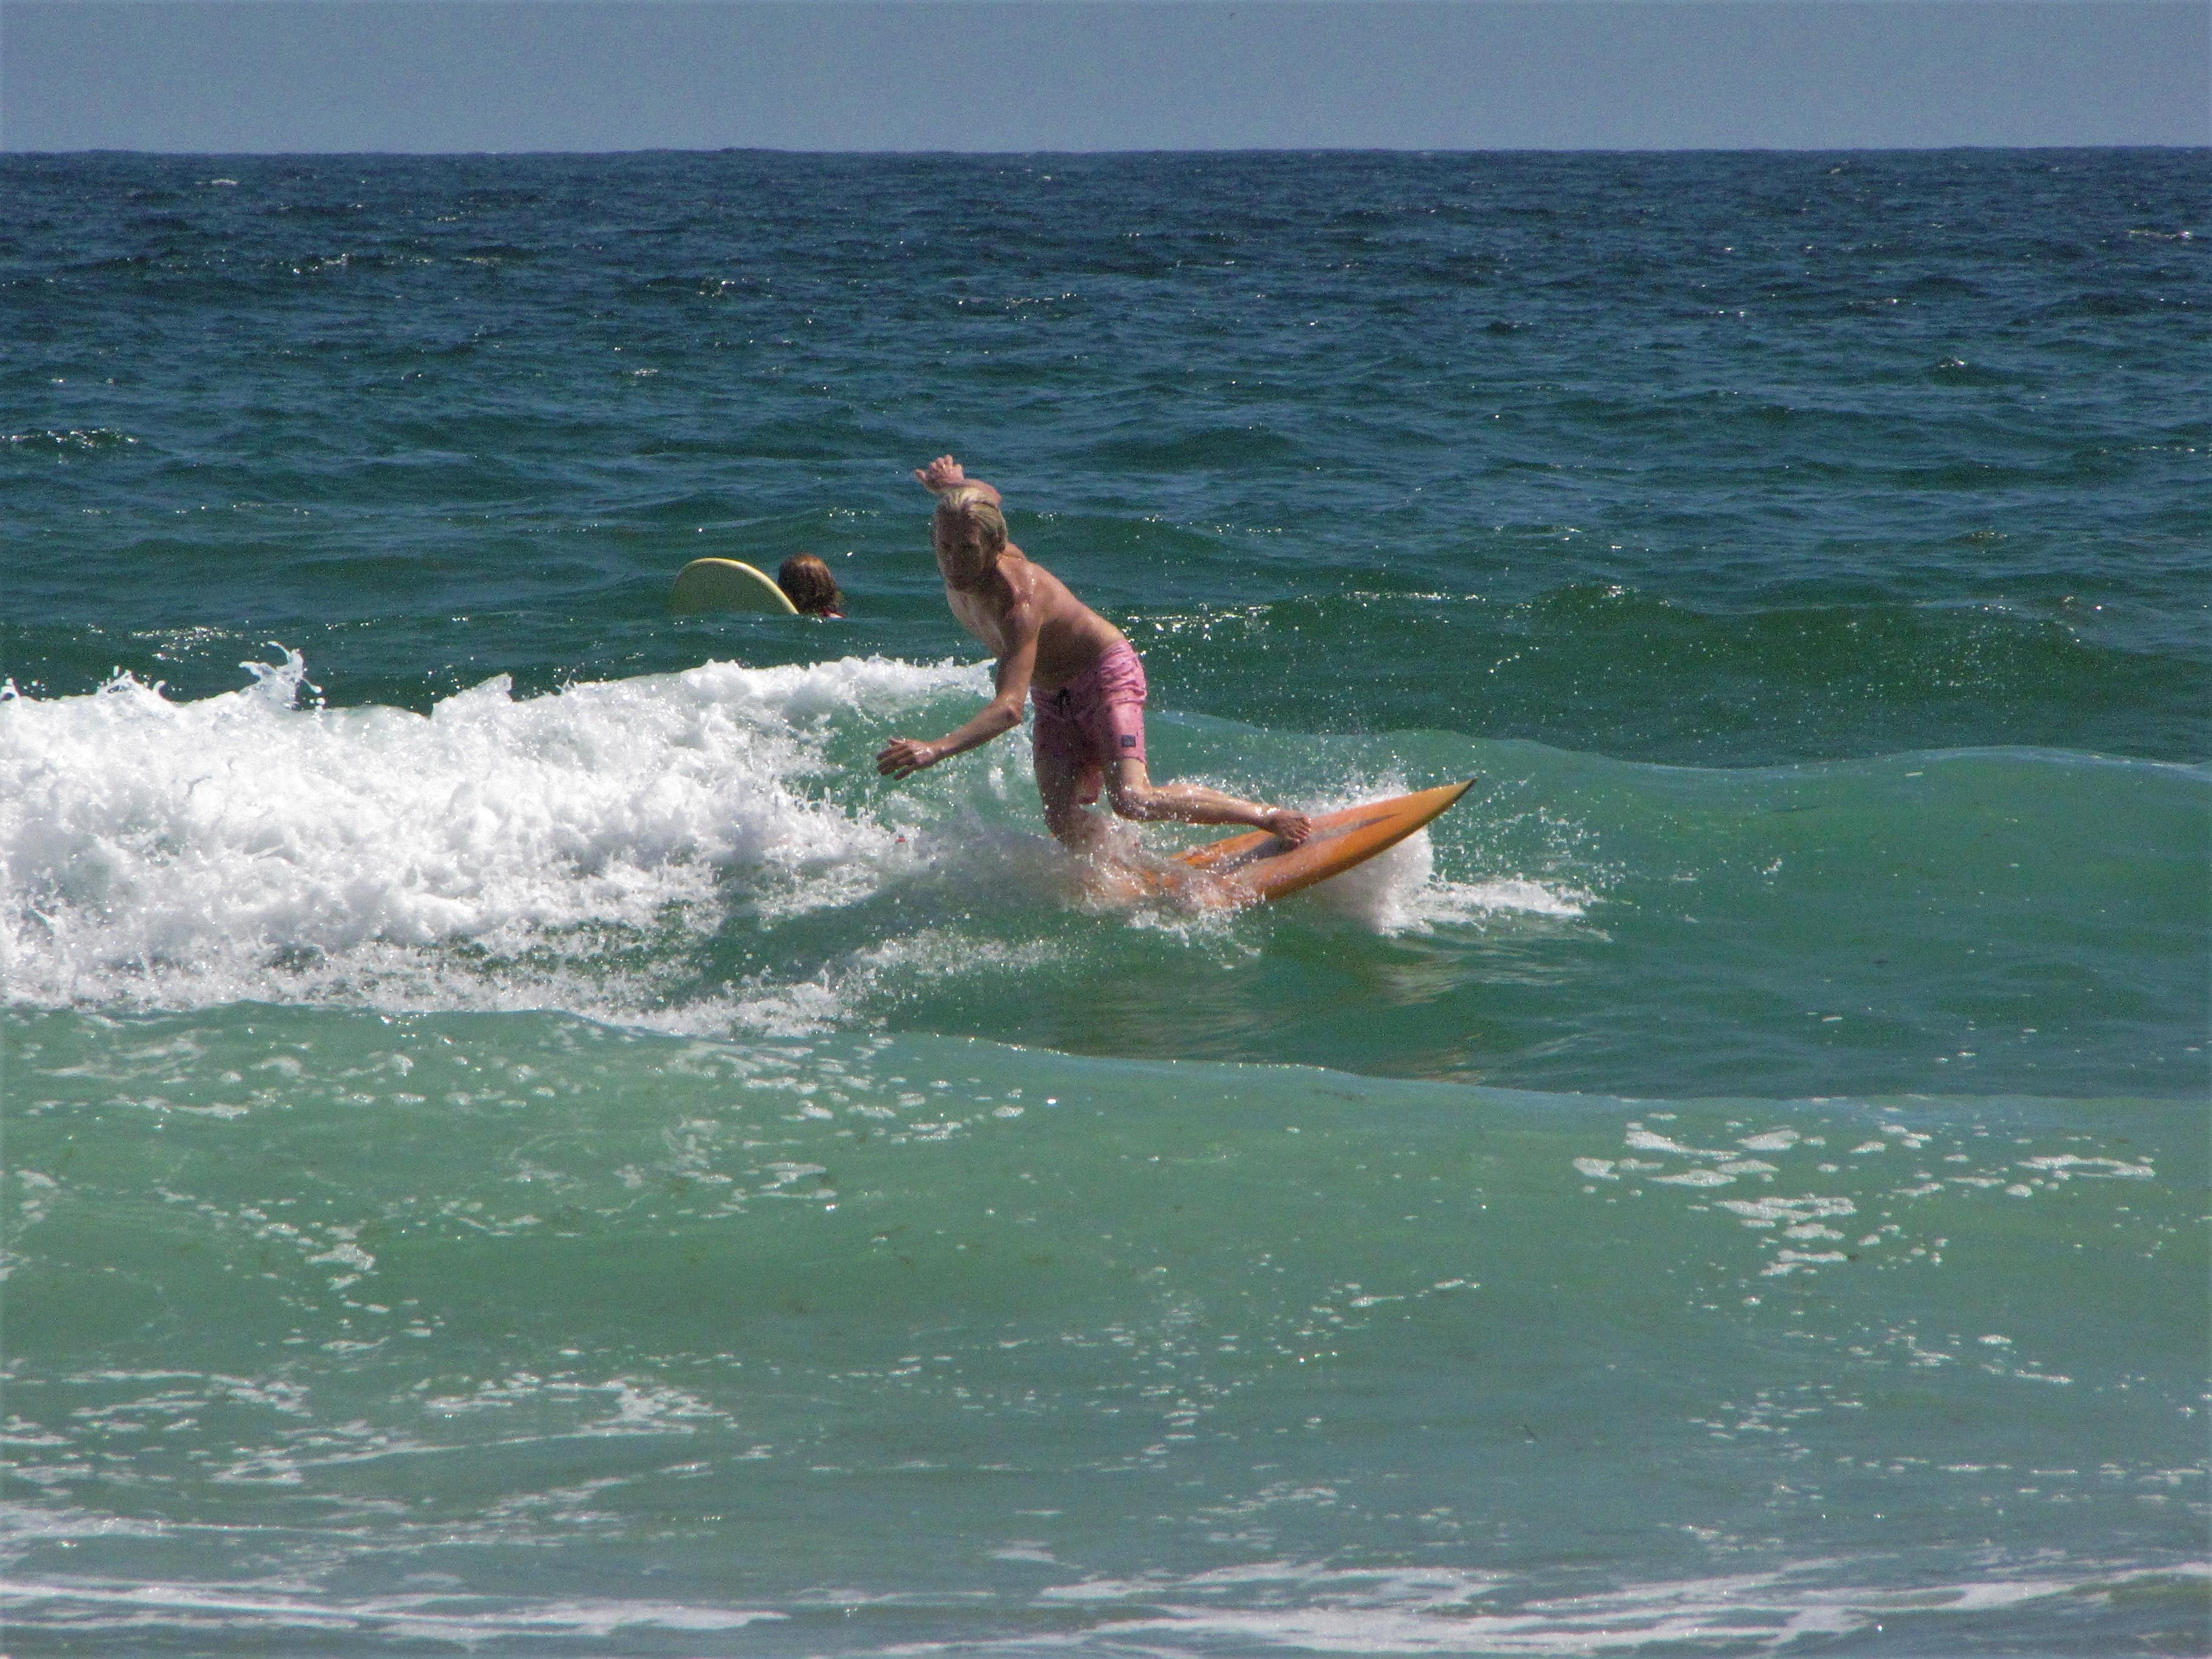 meia praia boardshort session